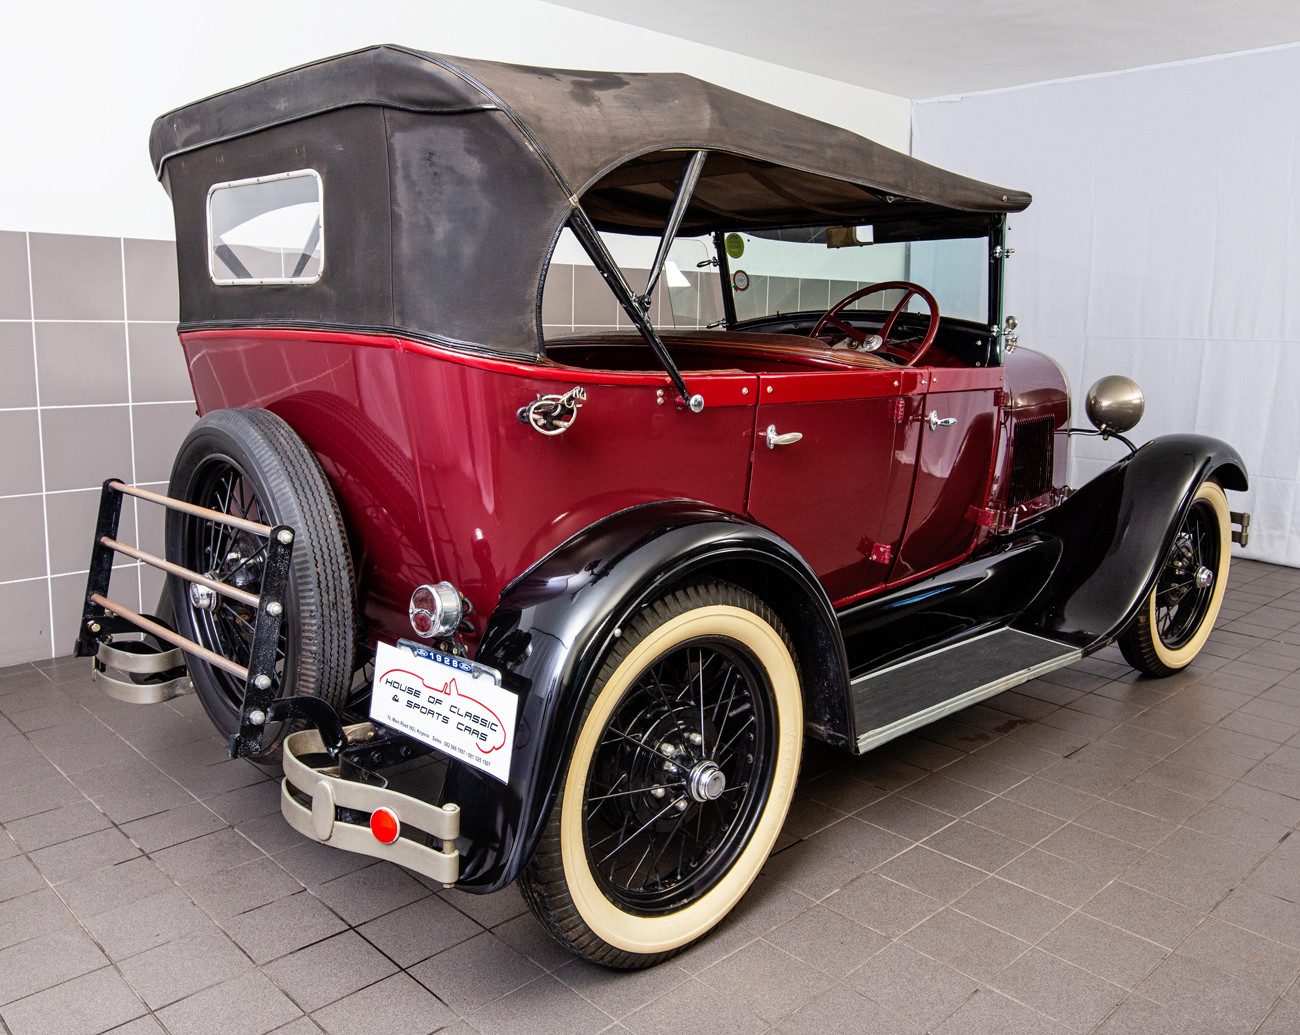 1928 MODEL A FORD PHAETON